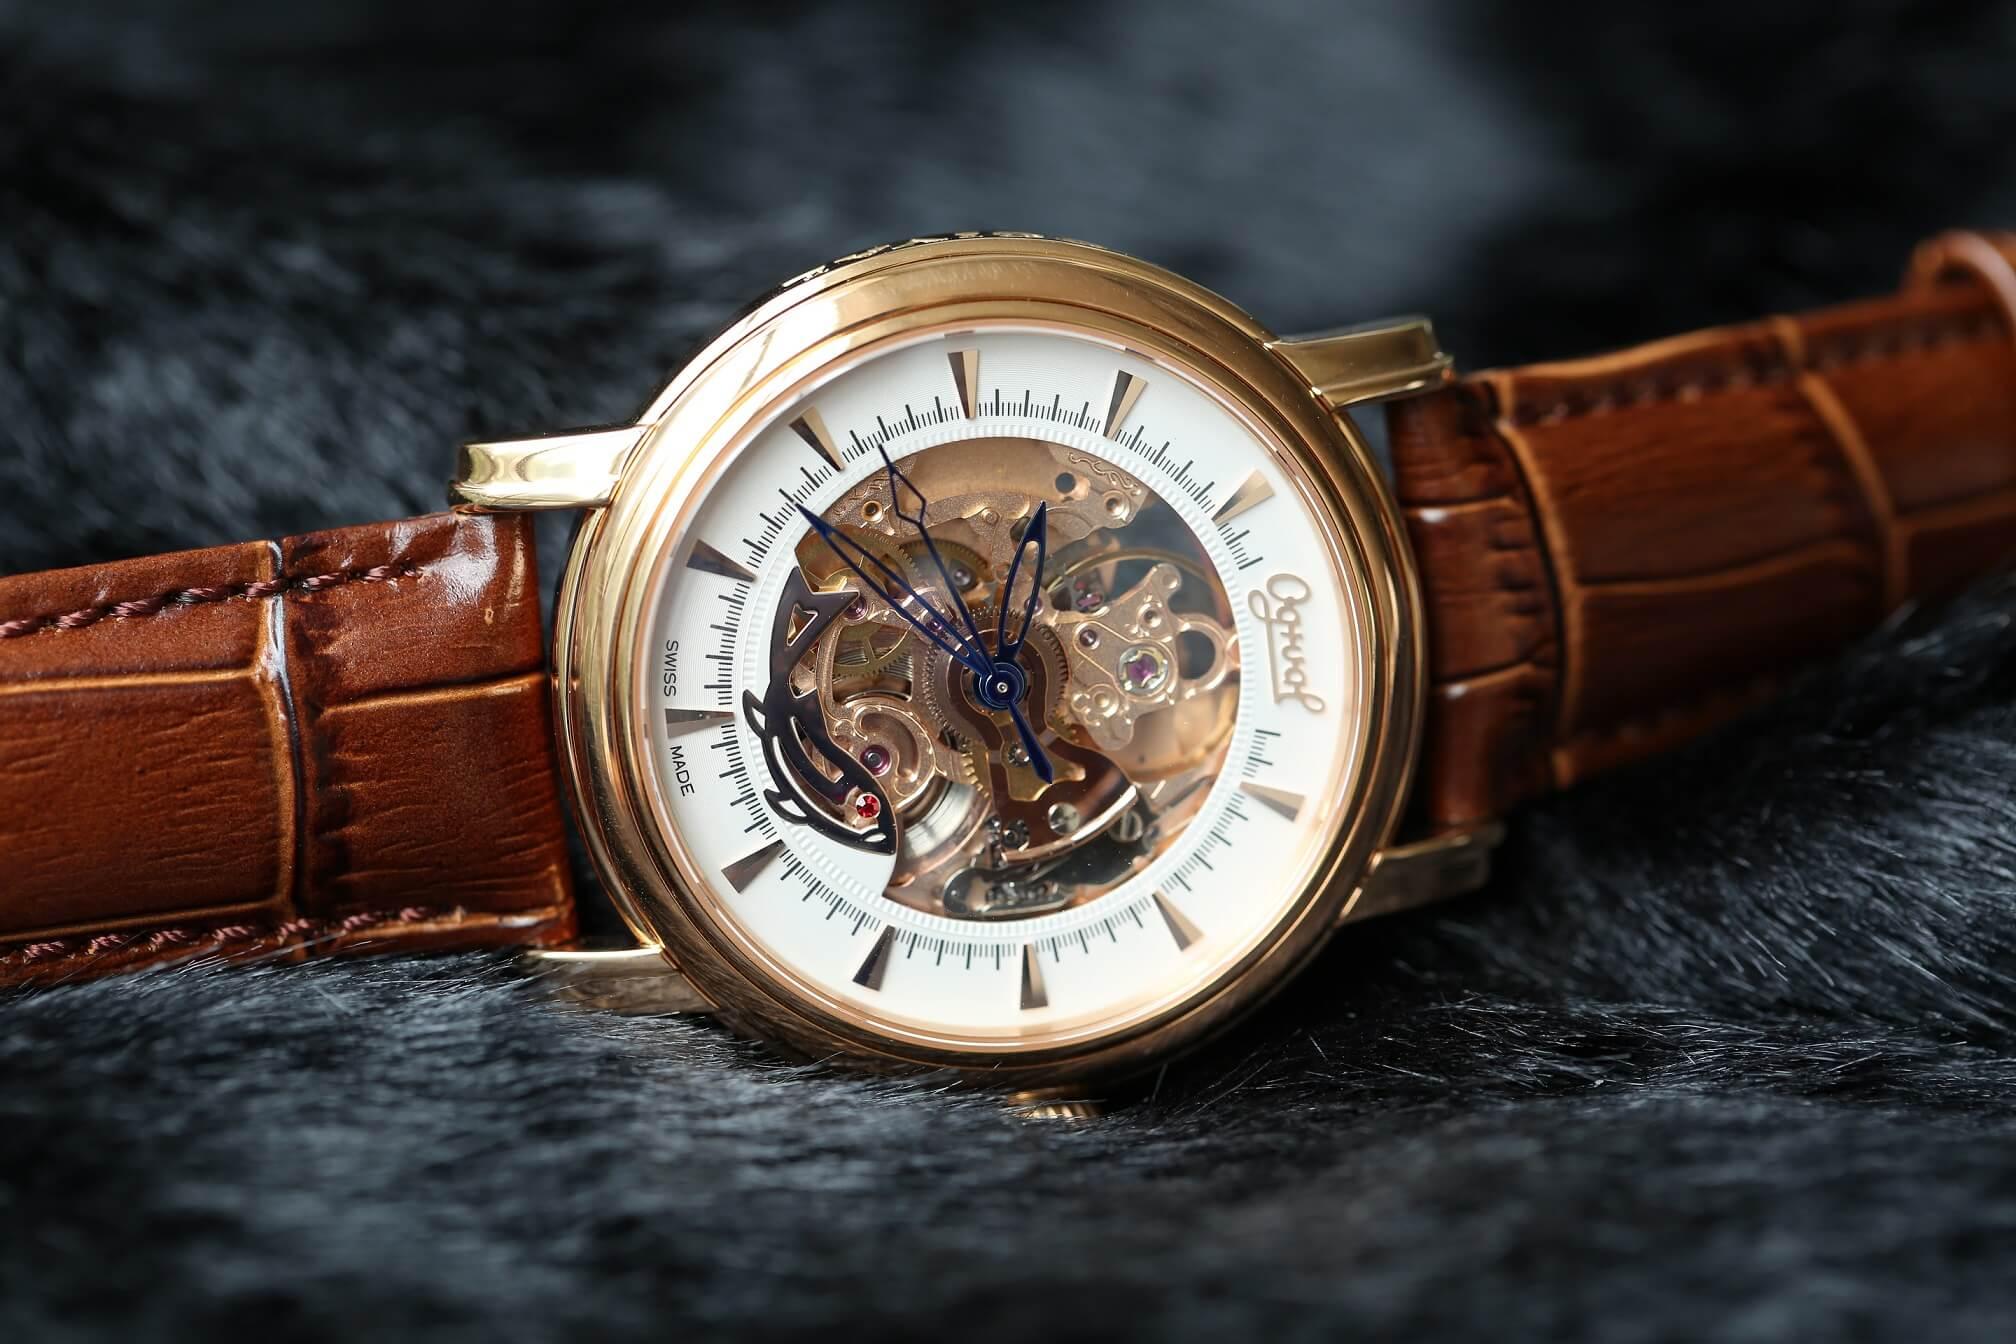 Đồng hồ ogival 18K gold tỏa sáng